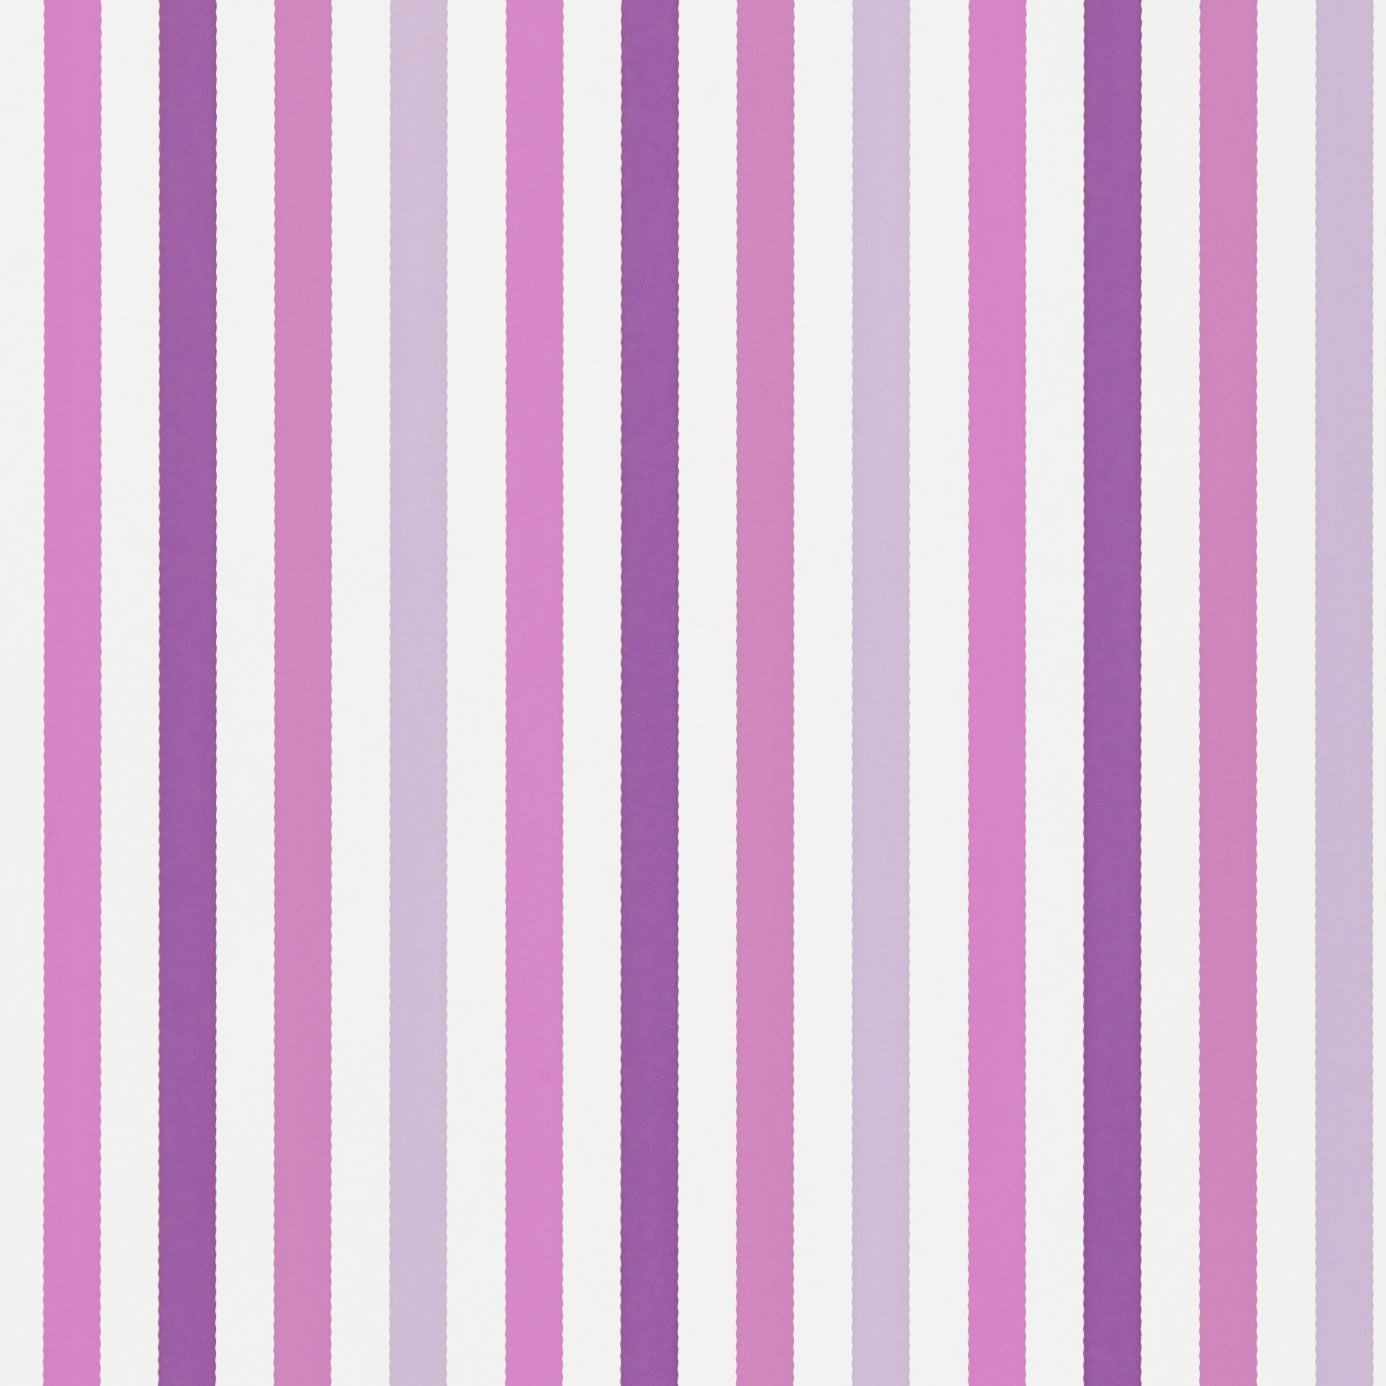 Pink And Purple Wallpaper Pink purple 1386x1386